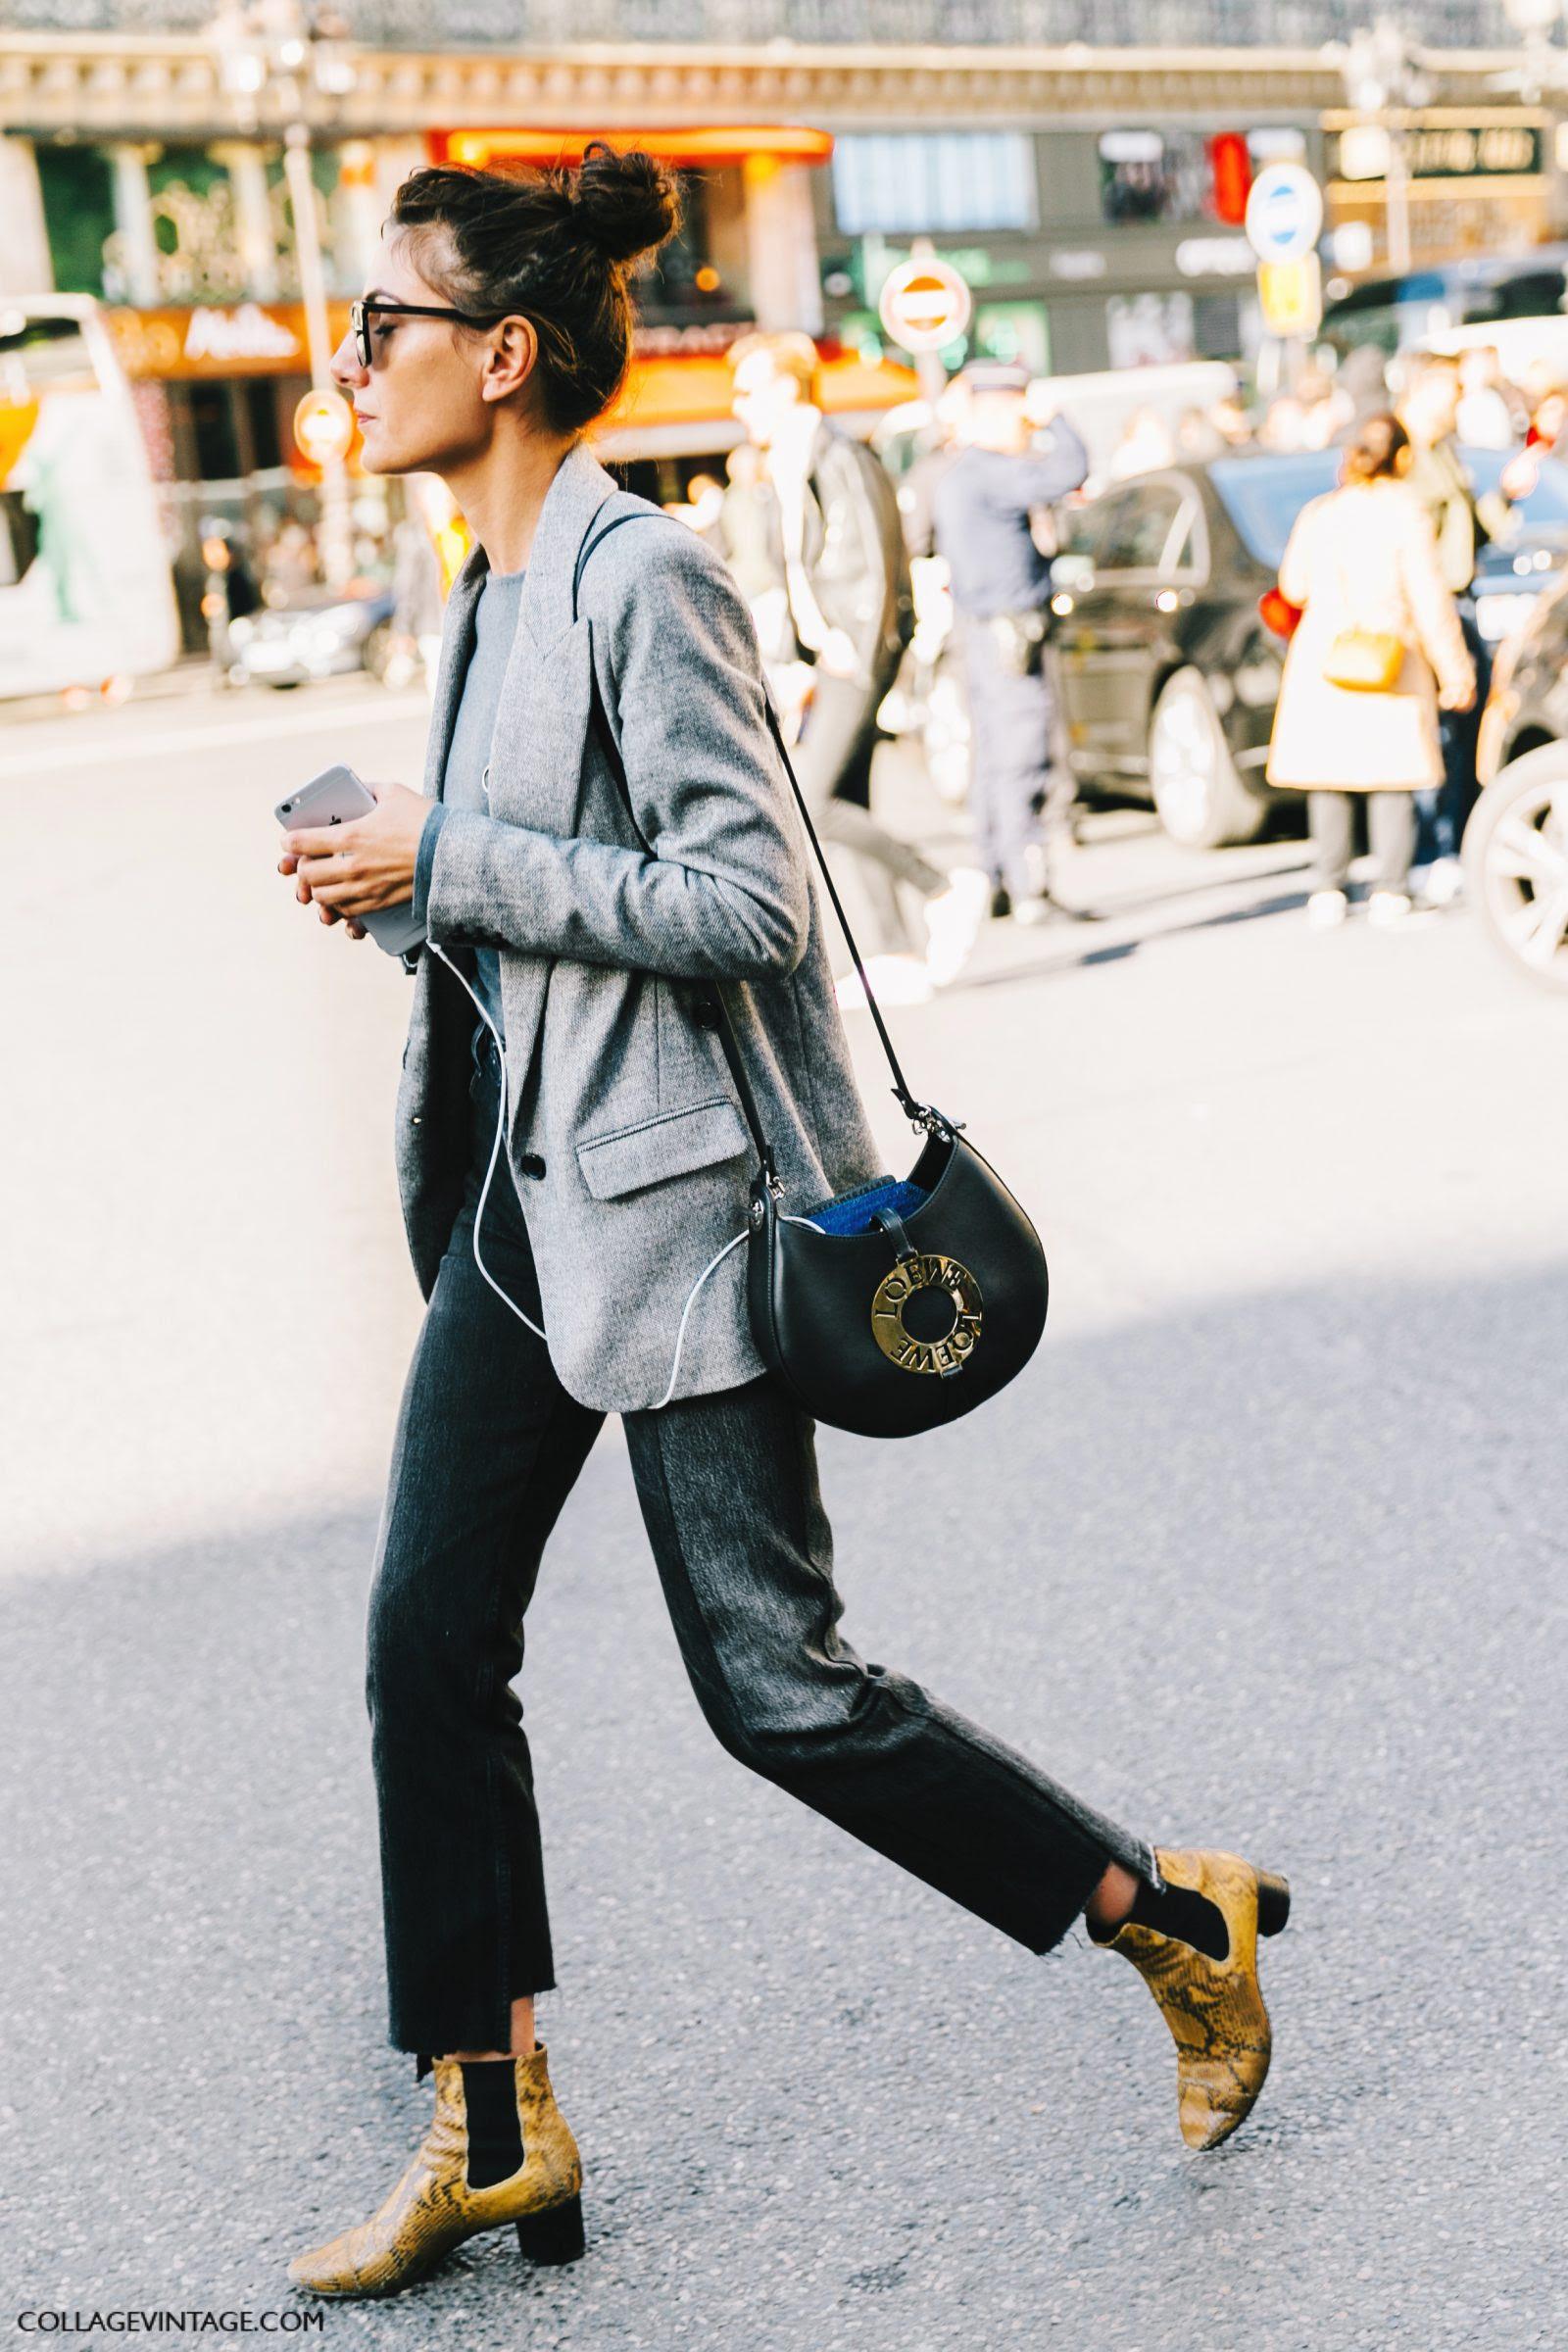 Pfw-paris_fashion_week_ss17-street_style-outfits-collage_vintage-olympia_letan-hermes-stella_mccartney-sacai-26